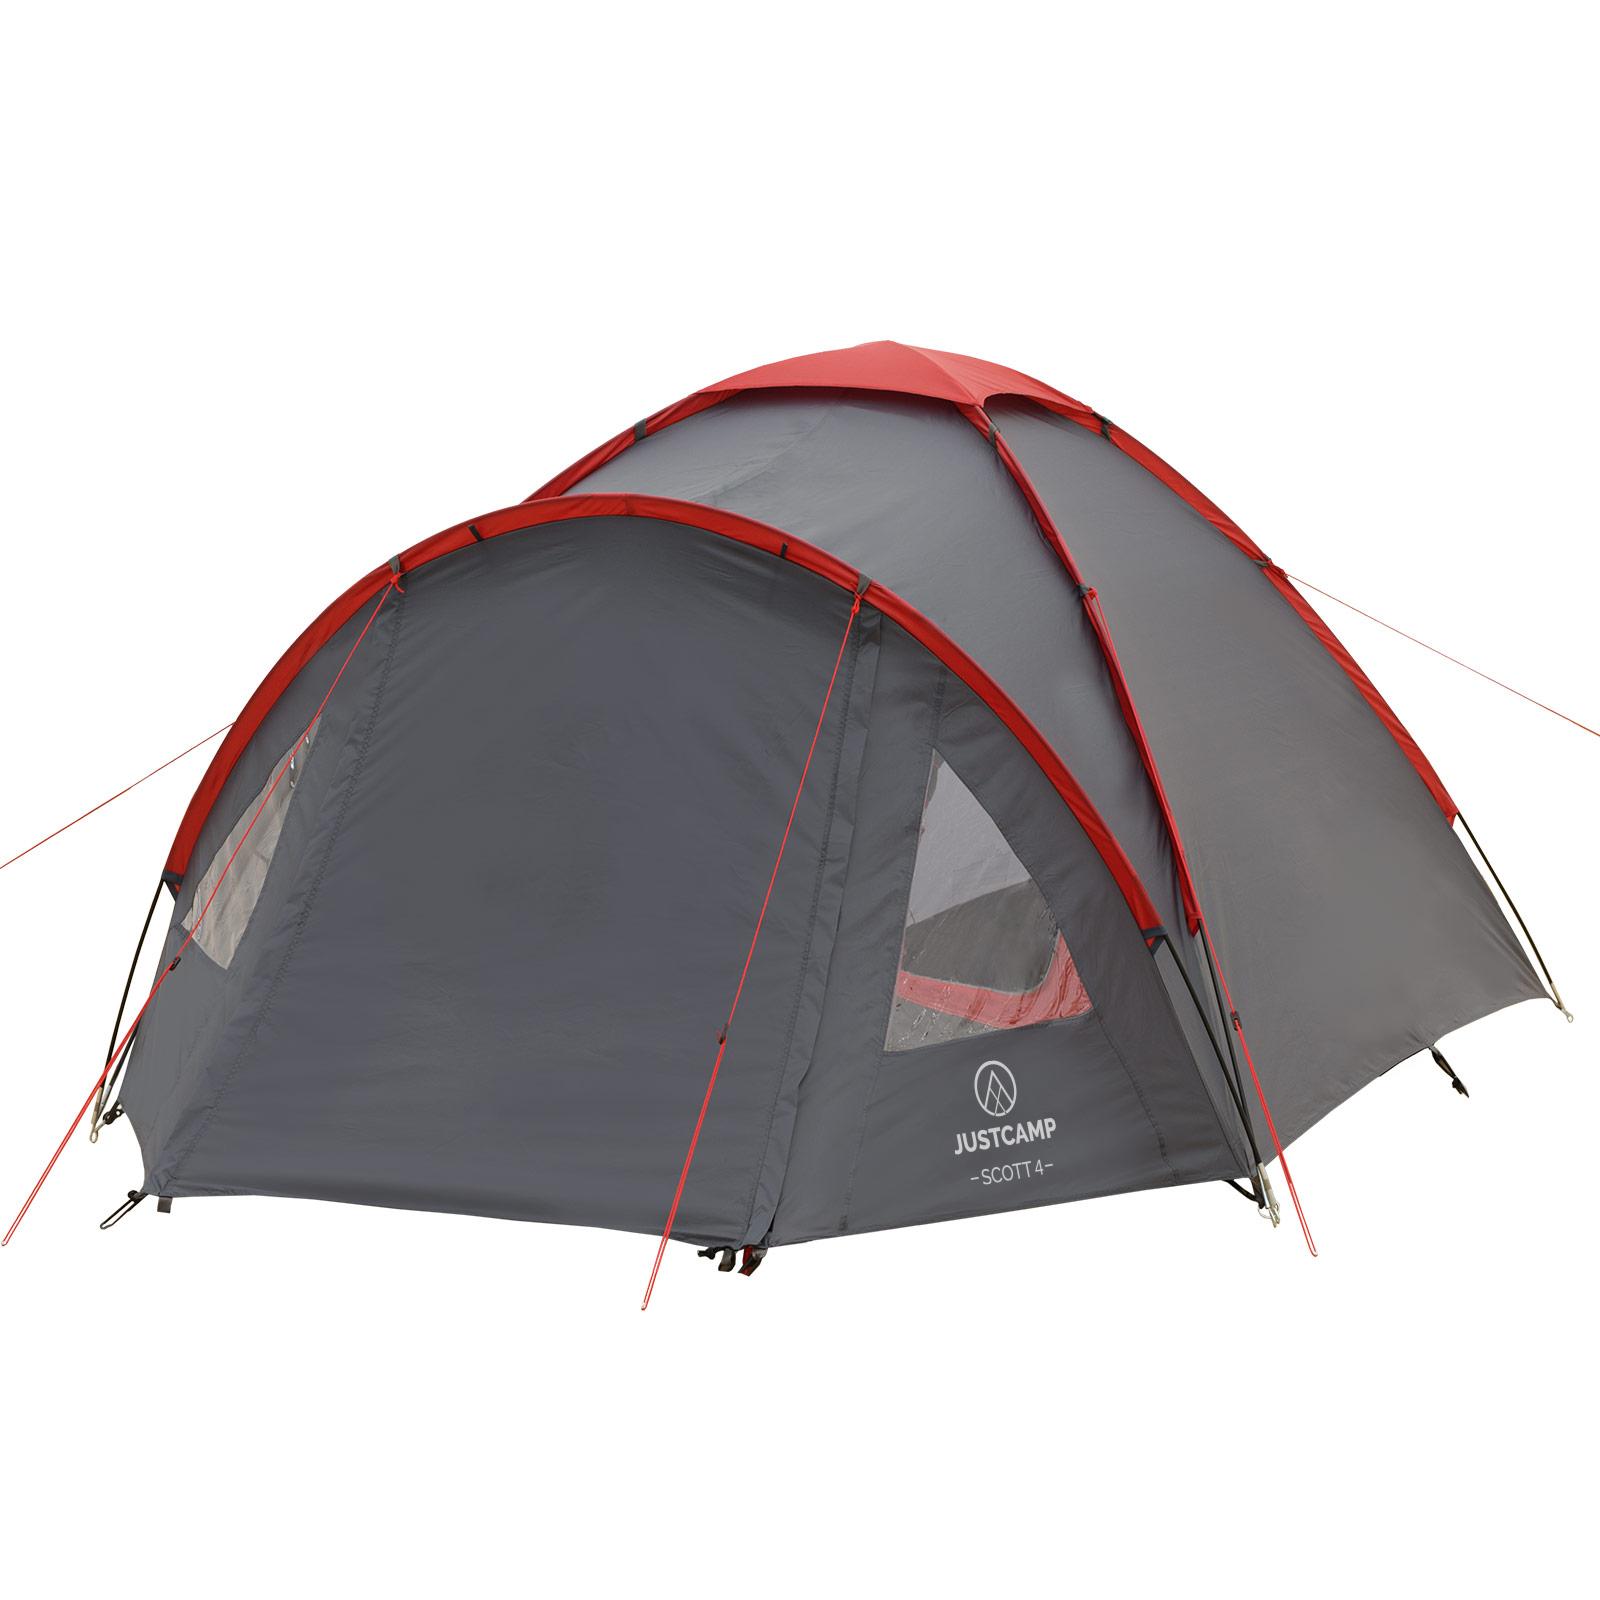 Campingzelt Campingzelt Campingzelt JUSTCAMP Scott 4 Mann Zelt Igluzelt Kuppelzelt für 4 Personen grau 99697b